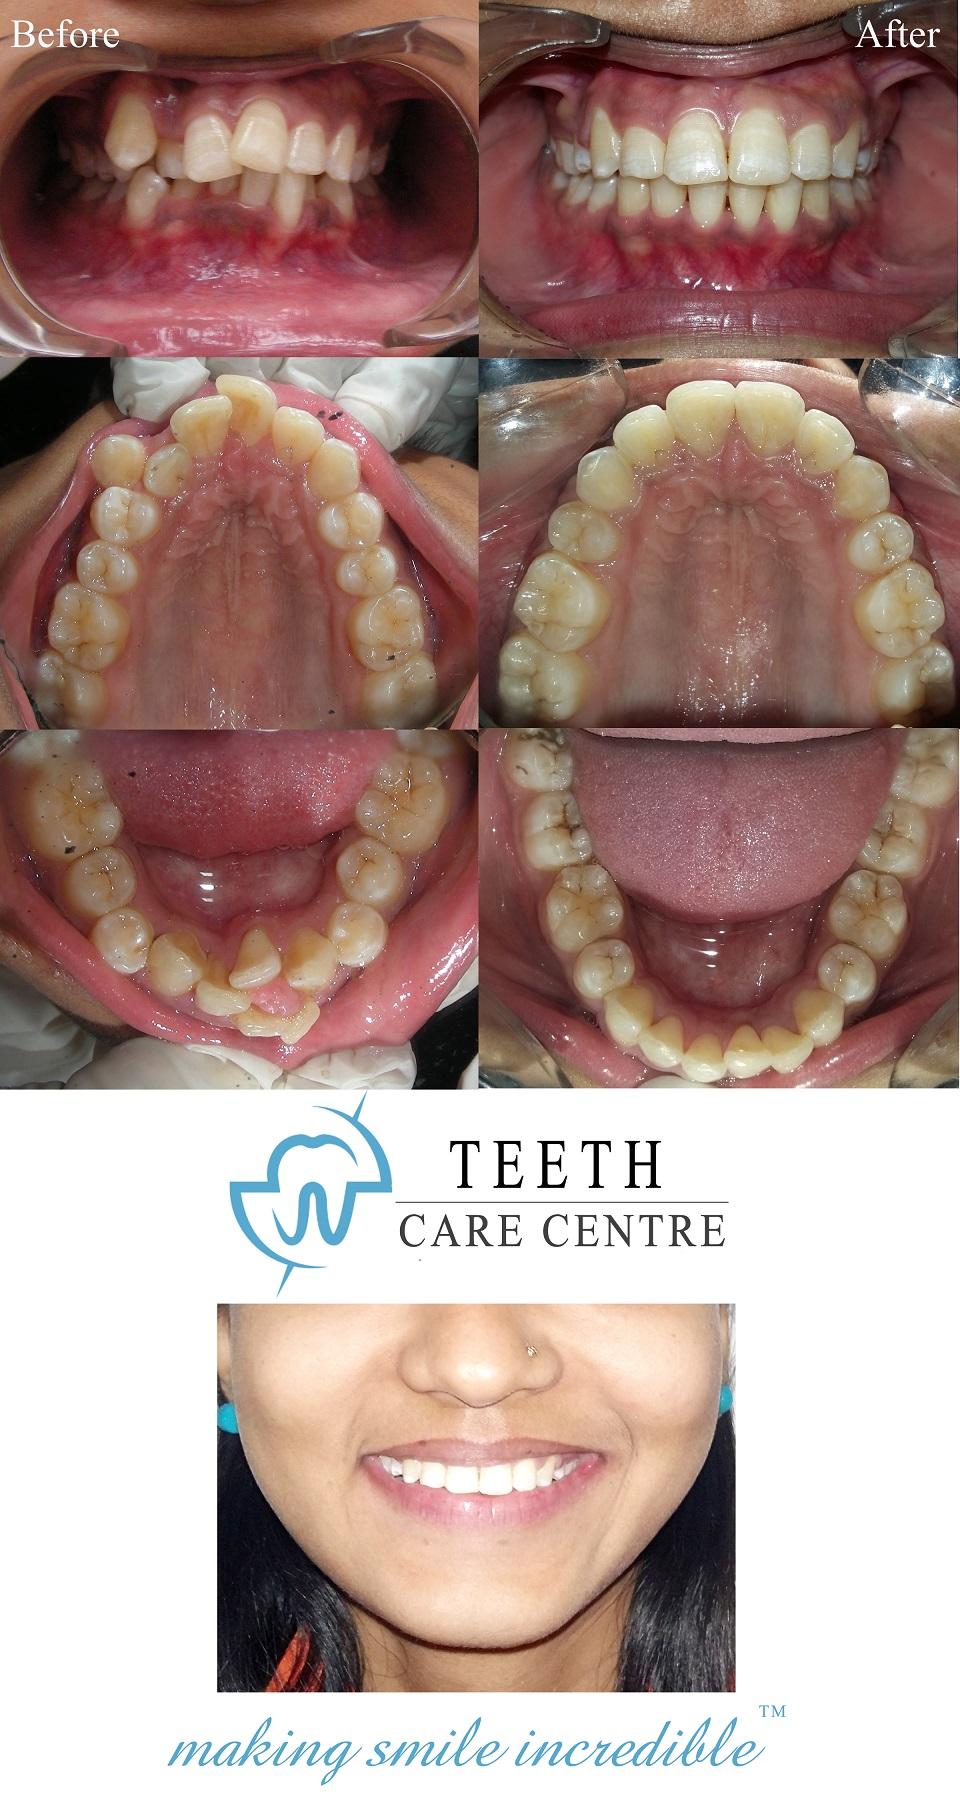 no 1 orthodontist ahmedabad nirav patel teeth care centre pankti patel aligner treatment invisalign braces specialist dental clinic dentist review testimonial treatment (8)